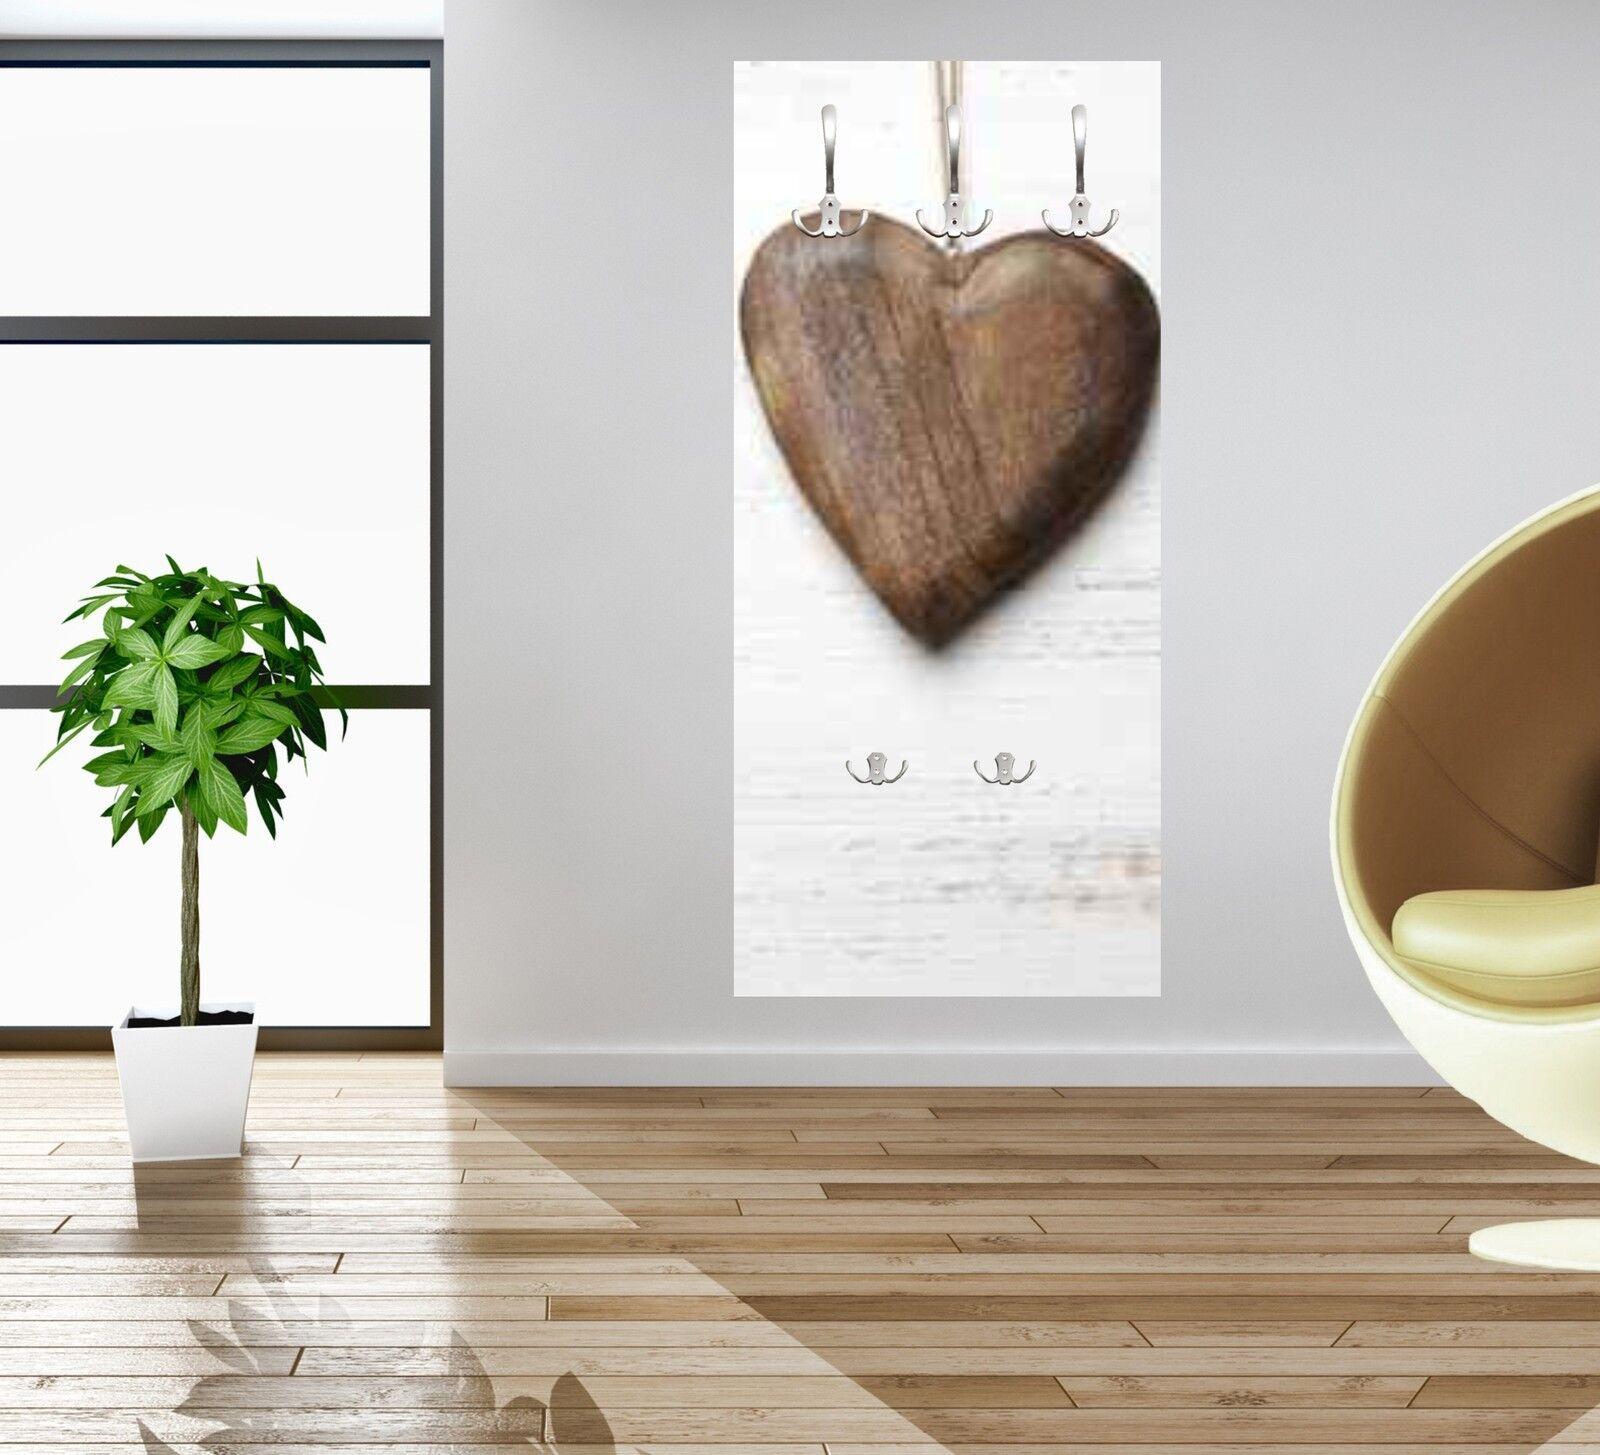 Wandgarderobe Herz aus Holz Holz Holz WG226 Garderobe Flurgarderobe | Das hochwertigste Material  881639